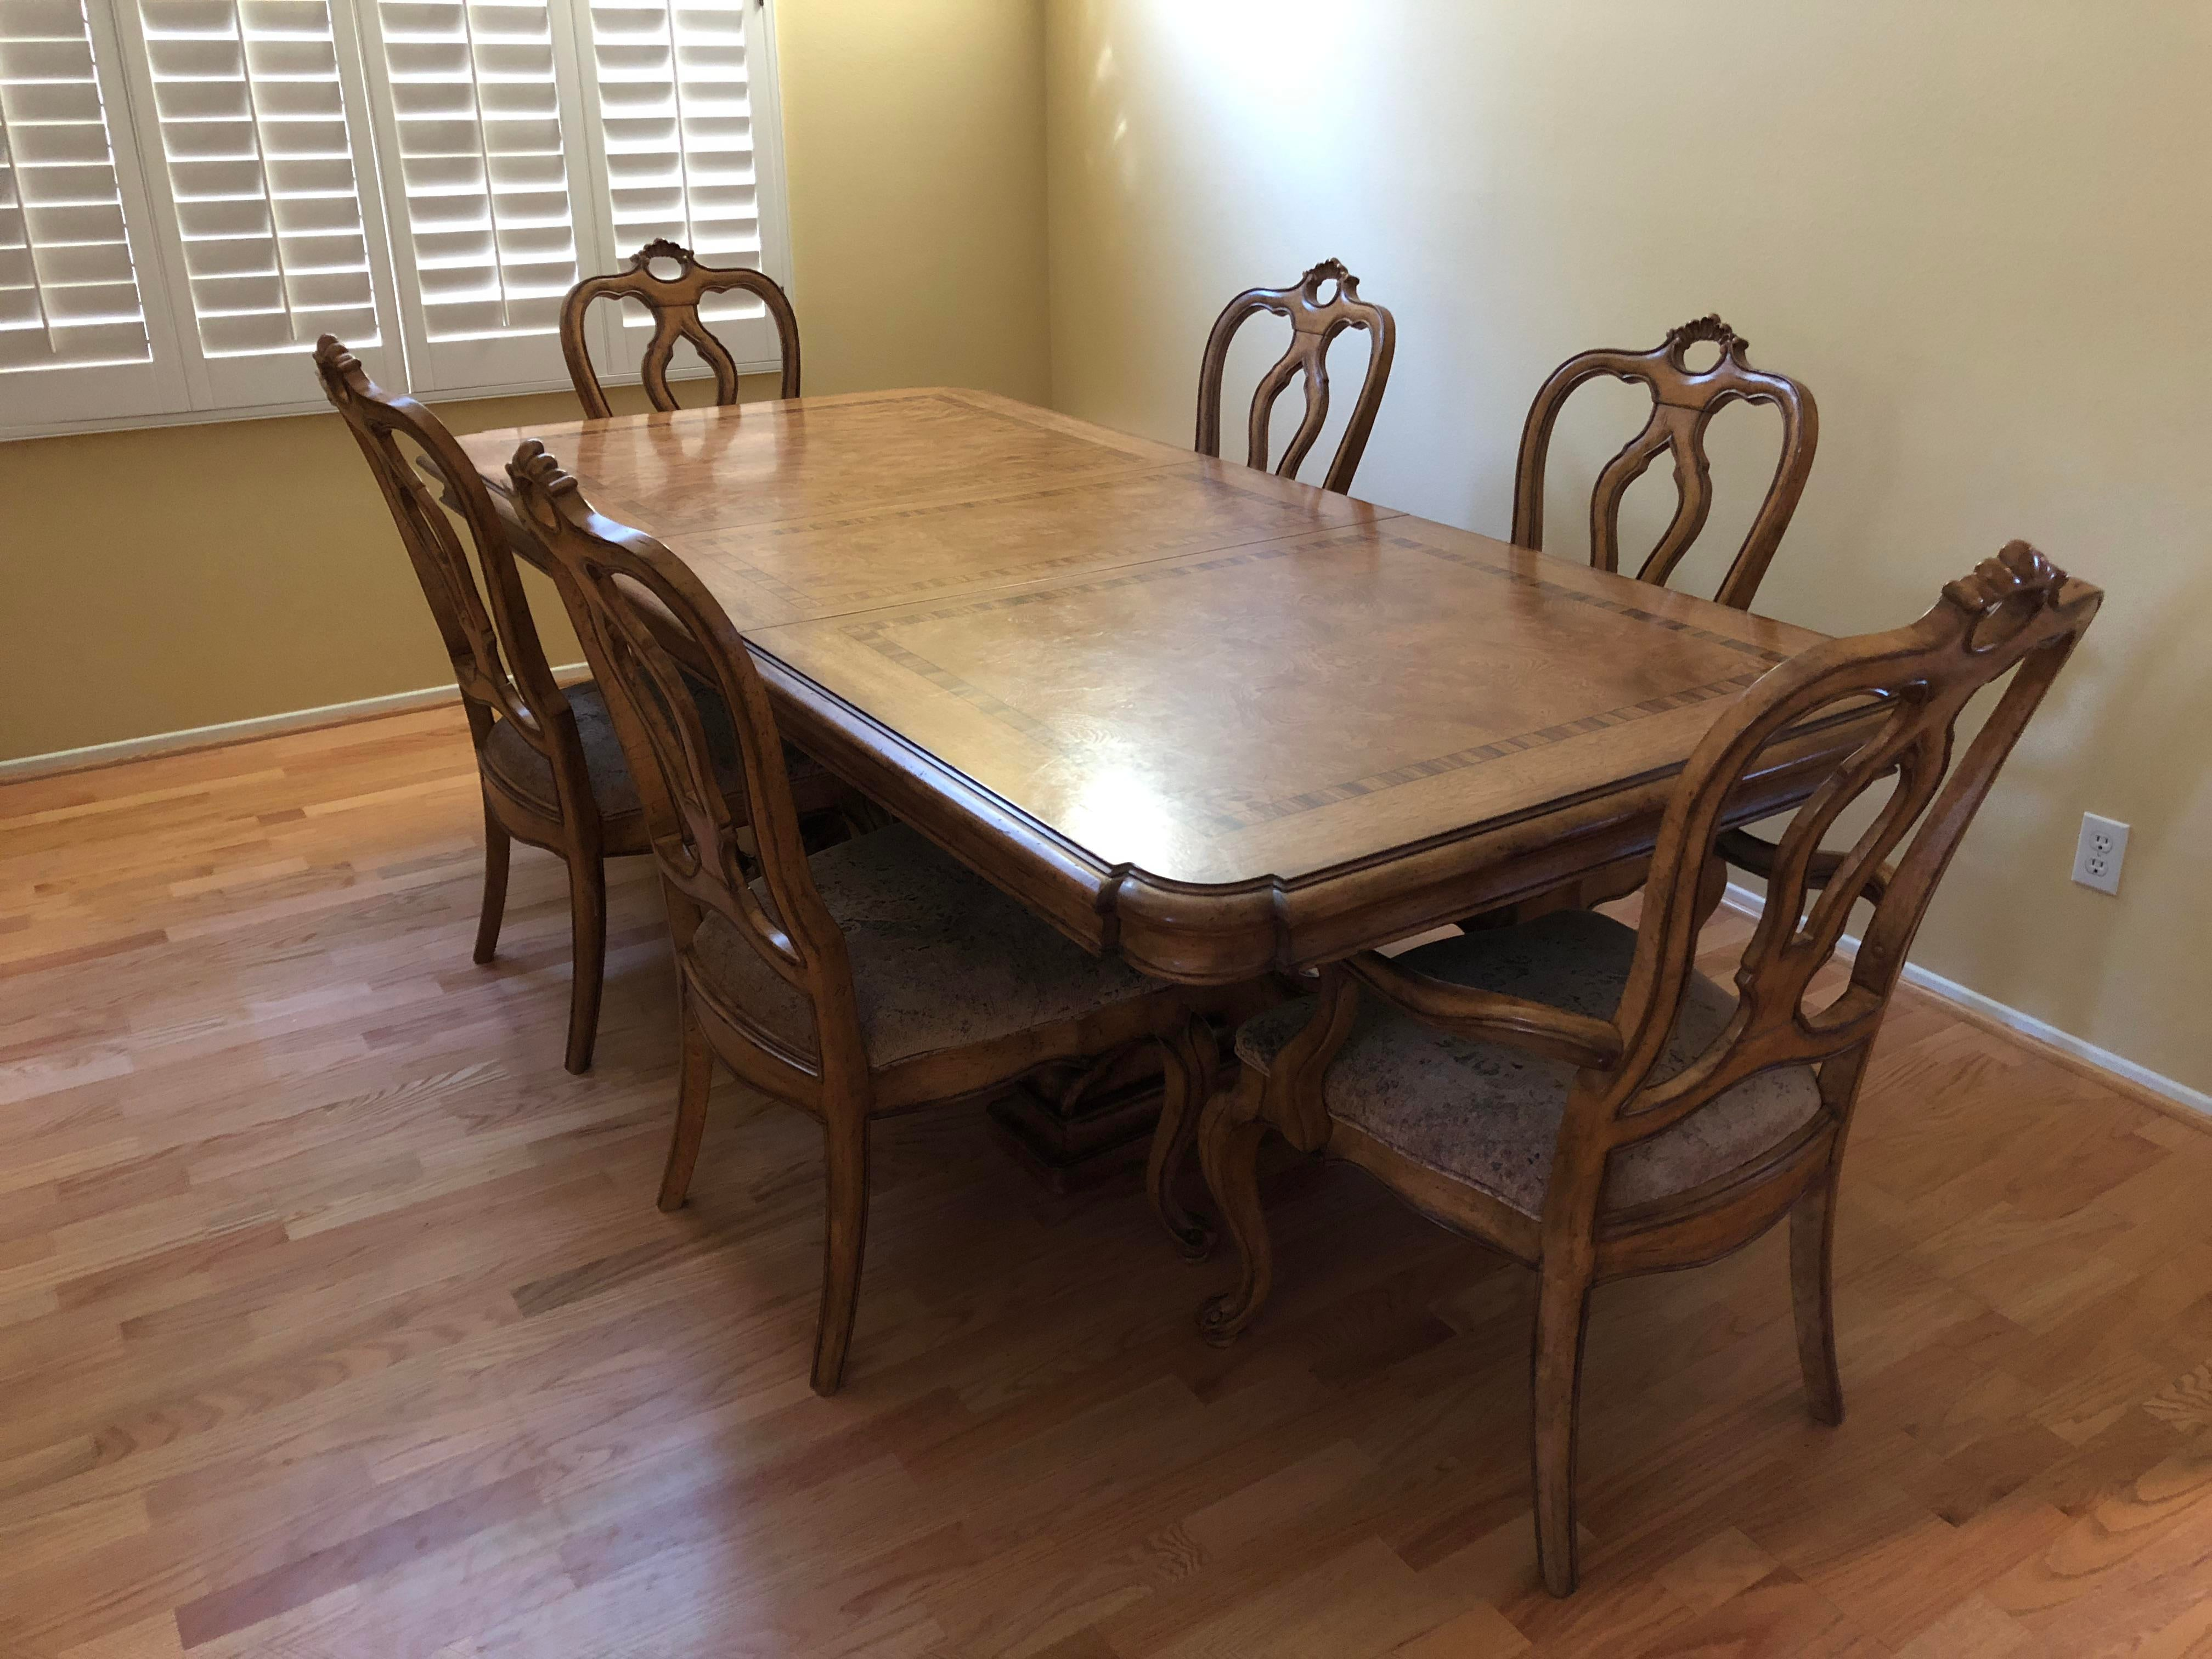 thomasville dining table bibbiano trestle dining table and rh chairish com thomasville dining table and hutch thomasville dining table prices